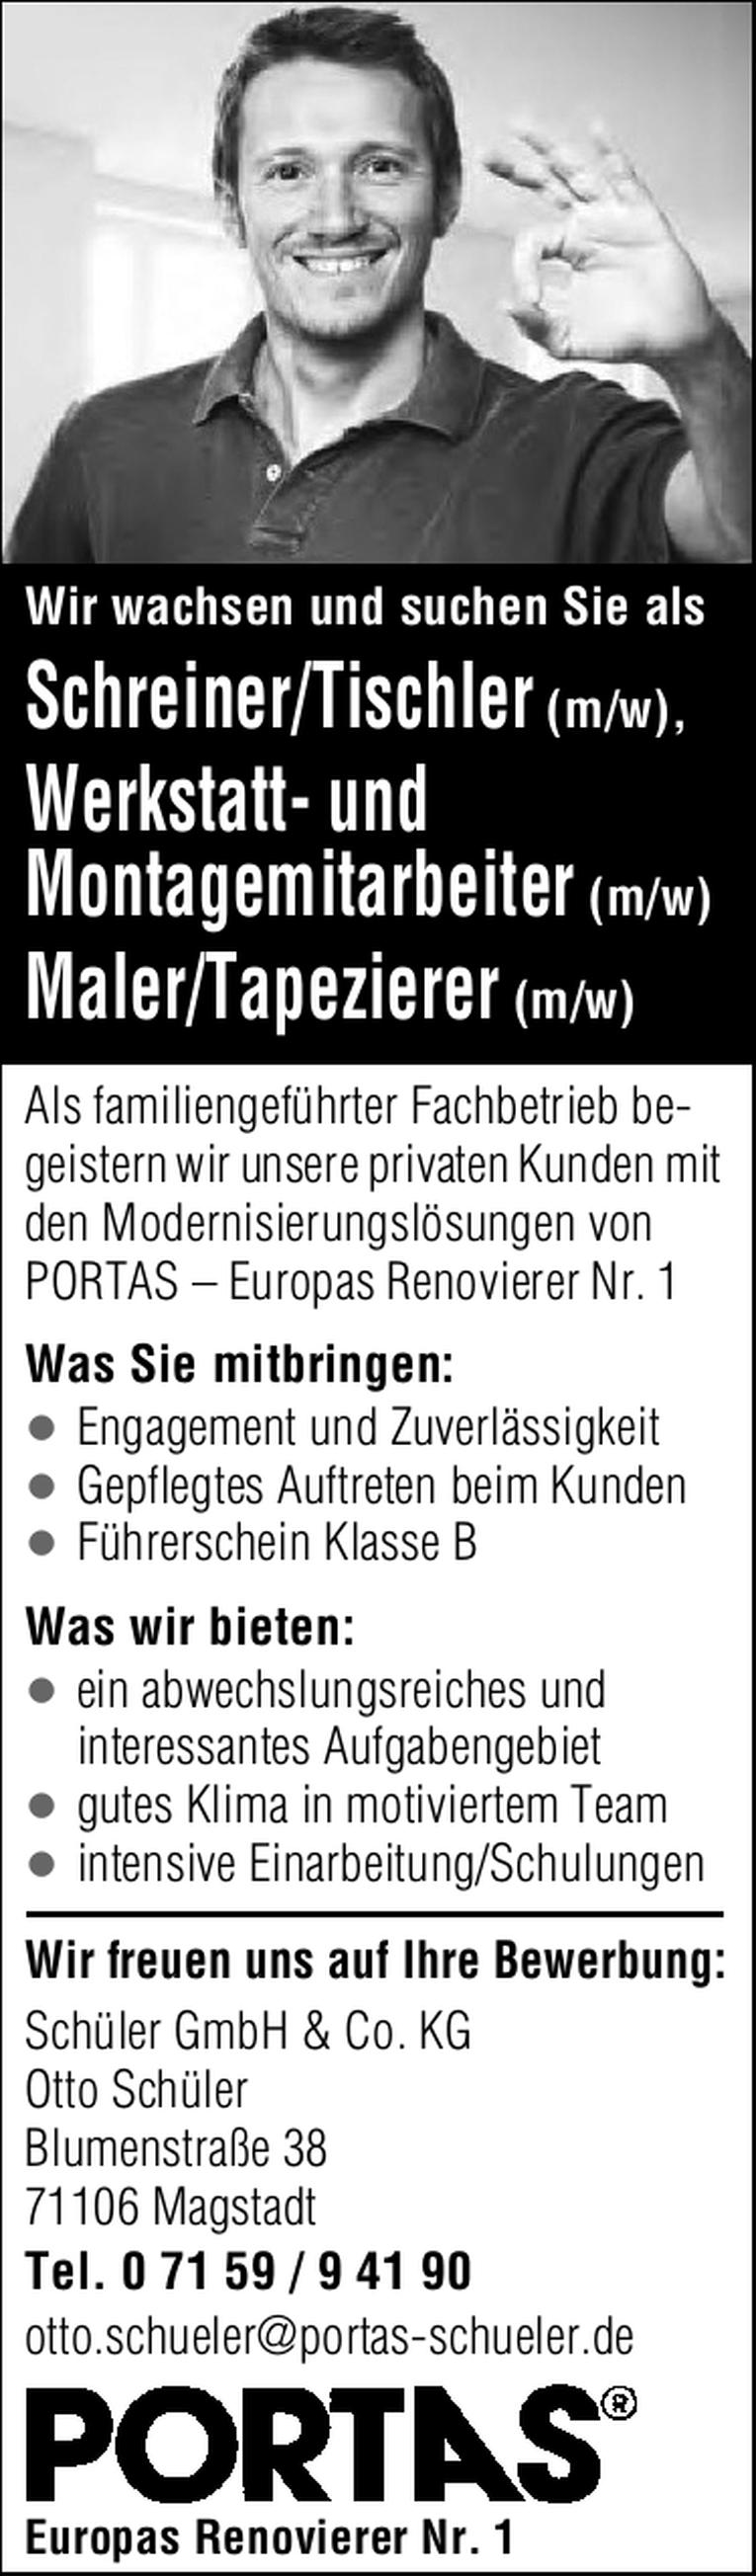 Maler/Tapezierer (m/w)